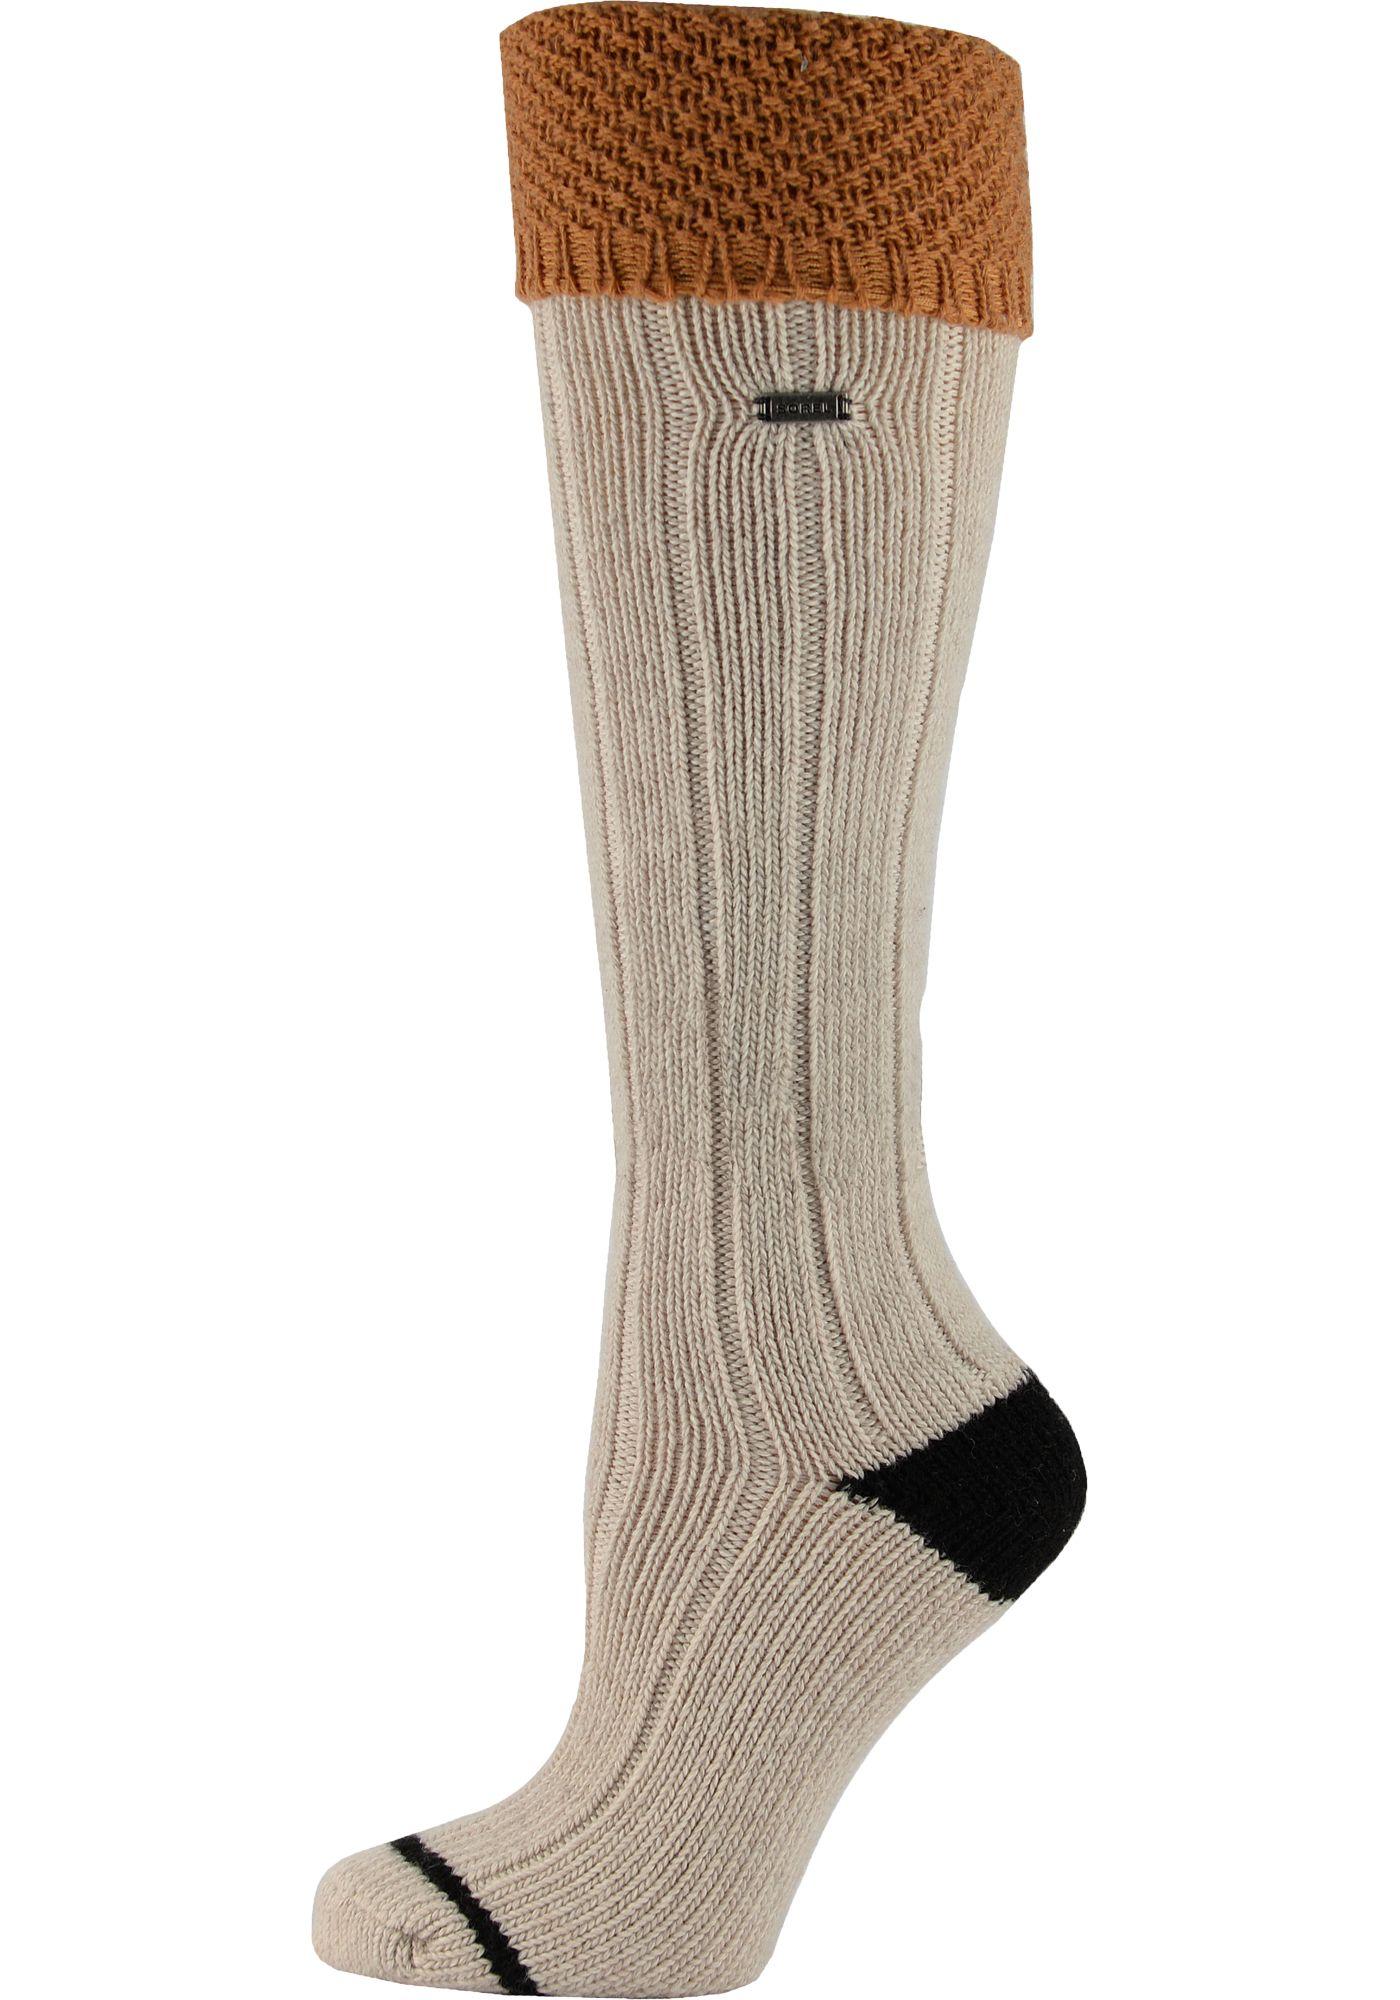 Sorel Women's Wool Turn Over Cuff Over the Calf Socks